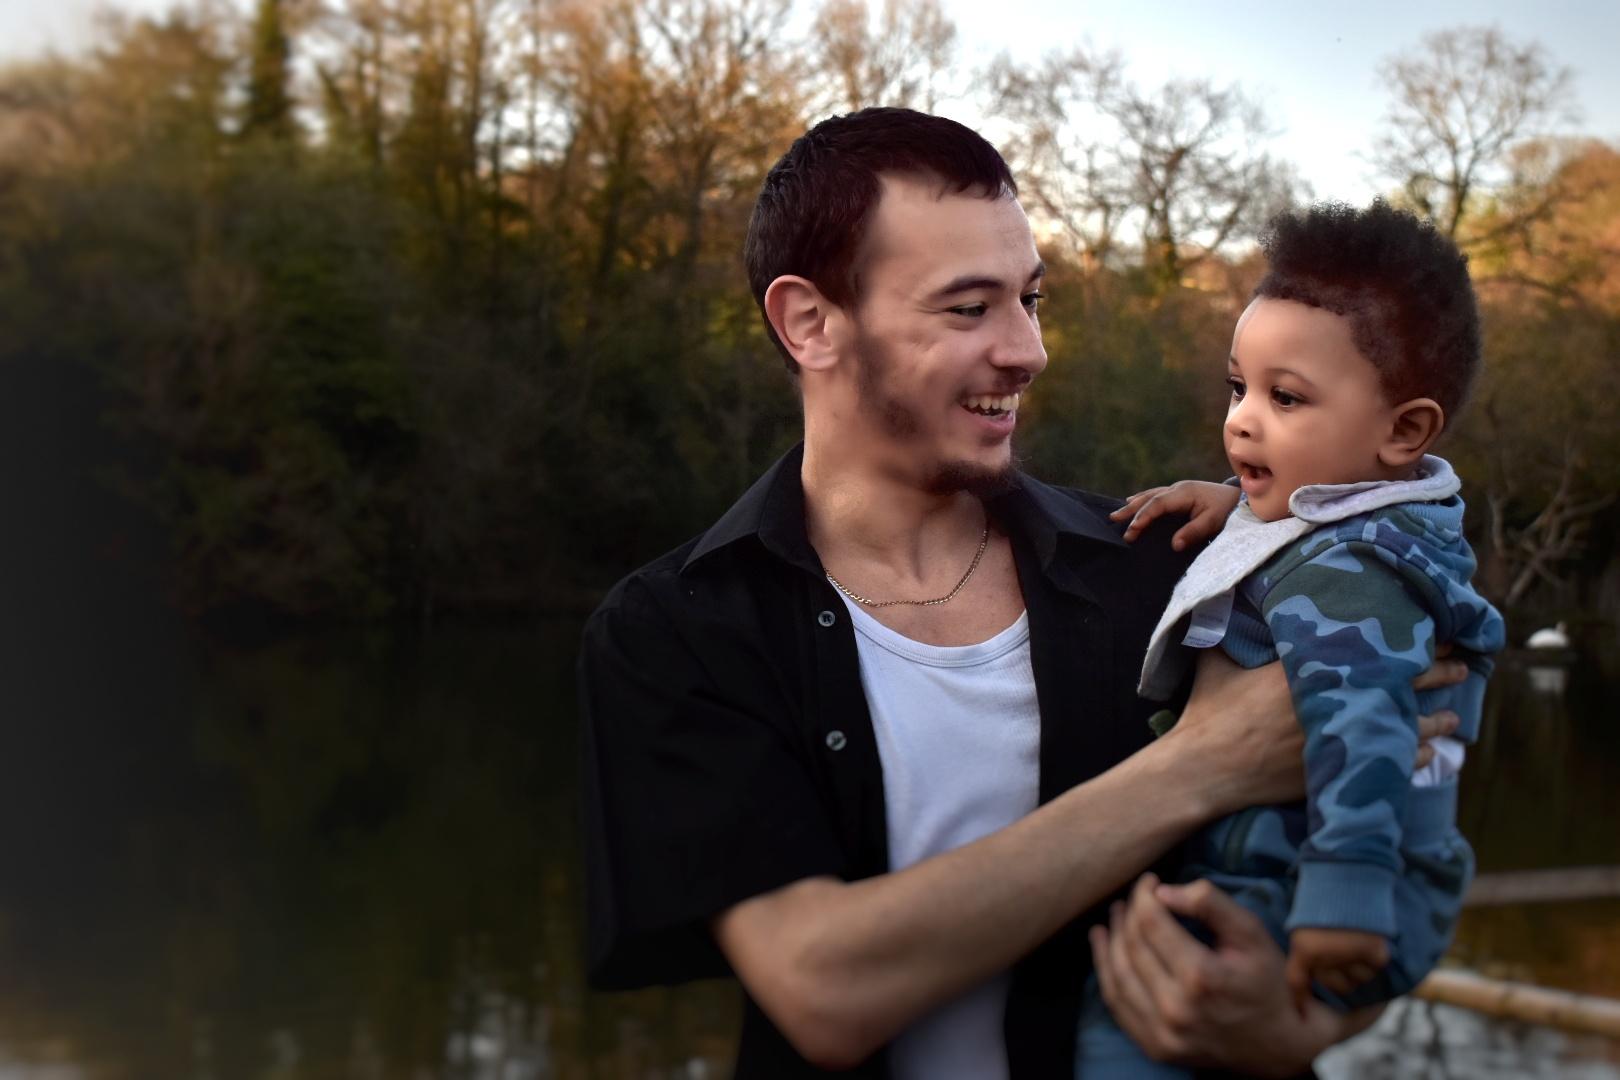 Family portraits, people, man & child,